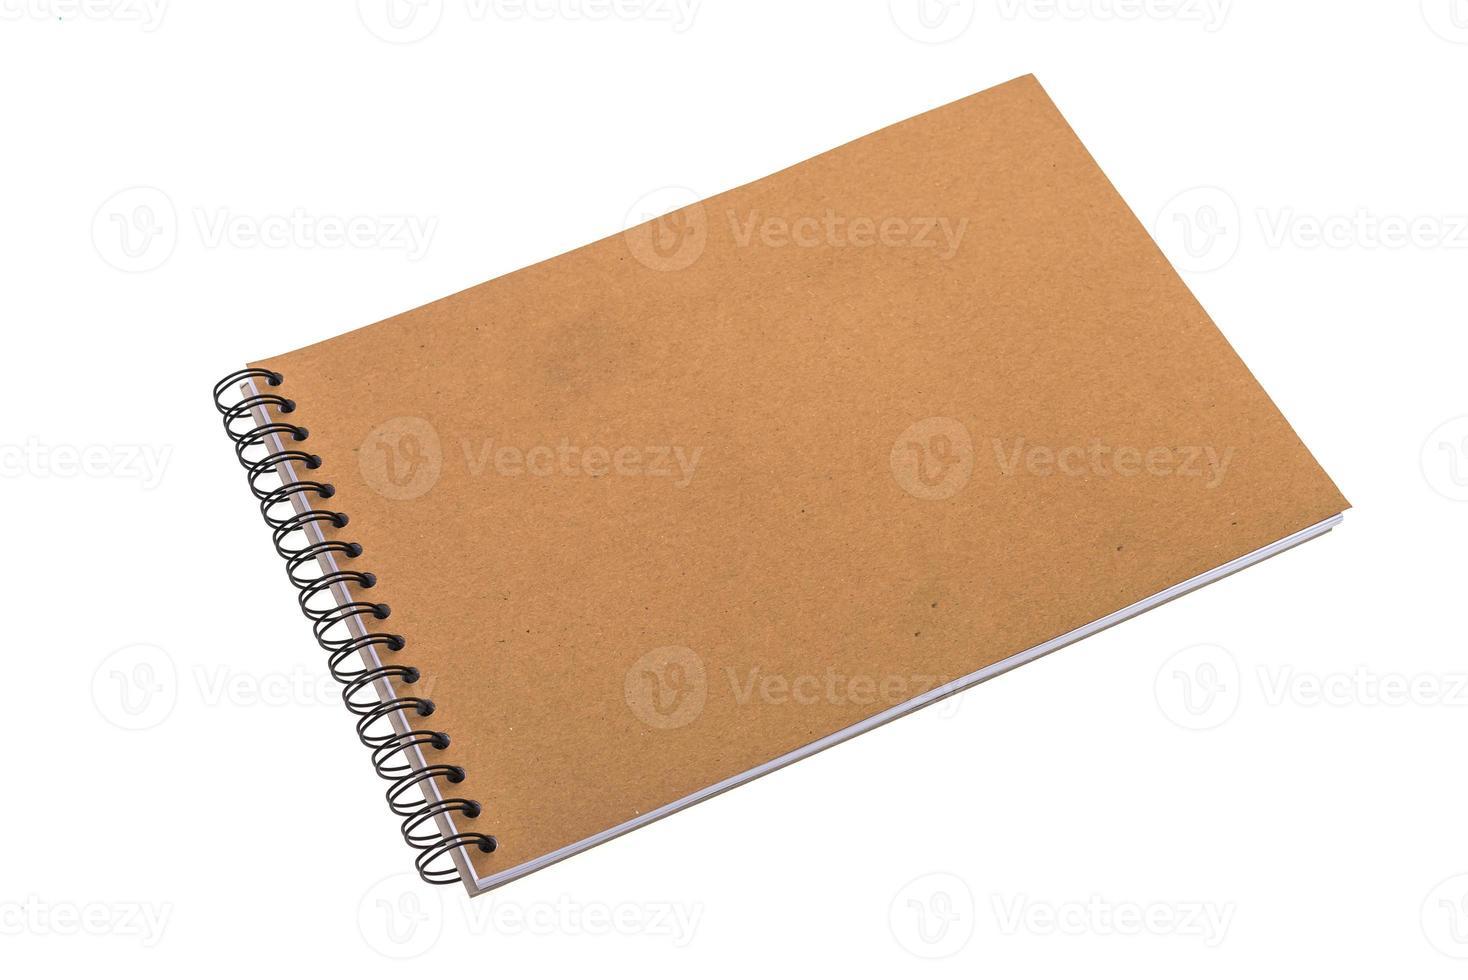 leeg leeg notitieboek foto